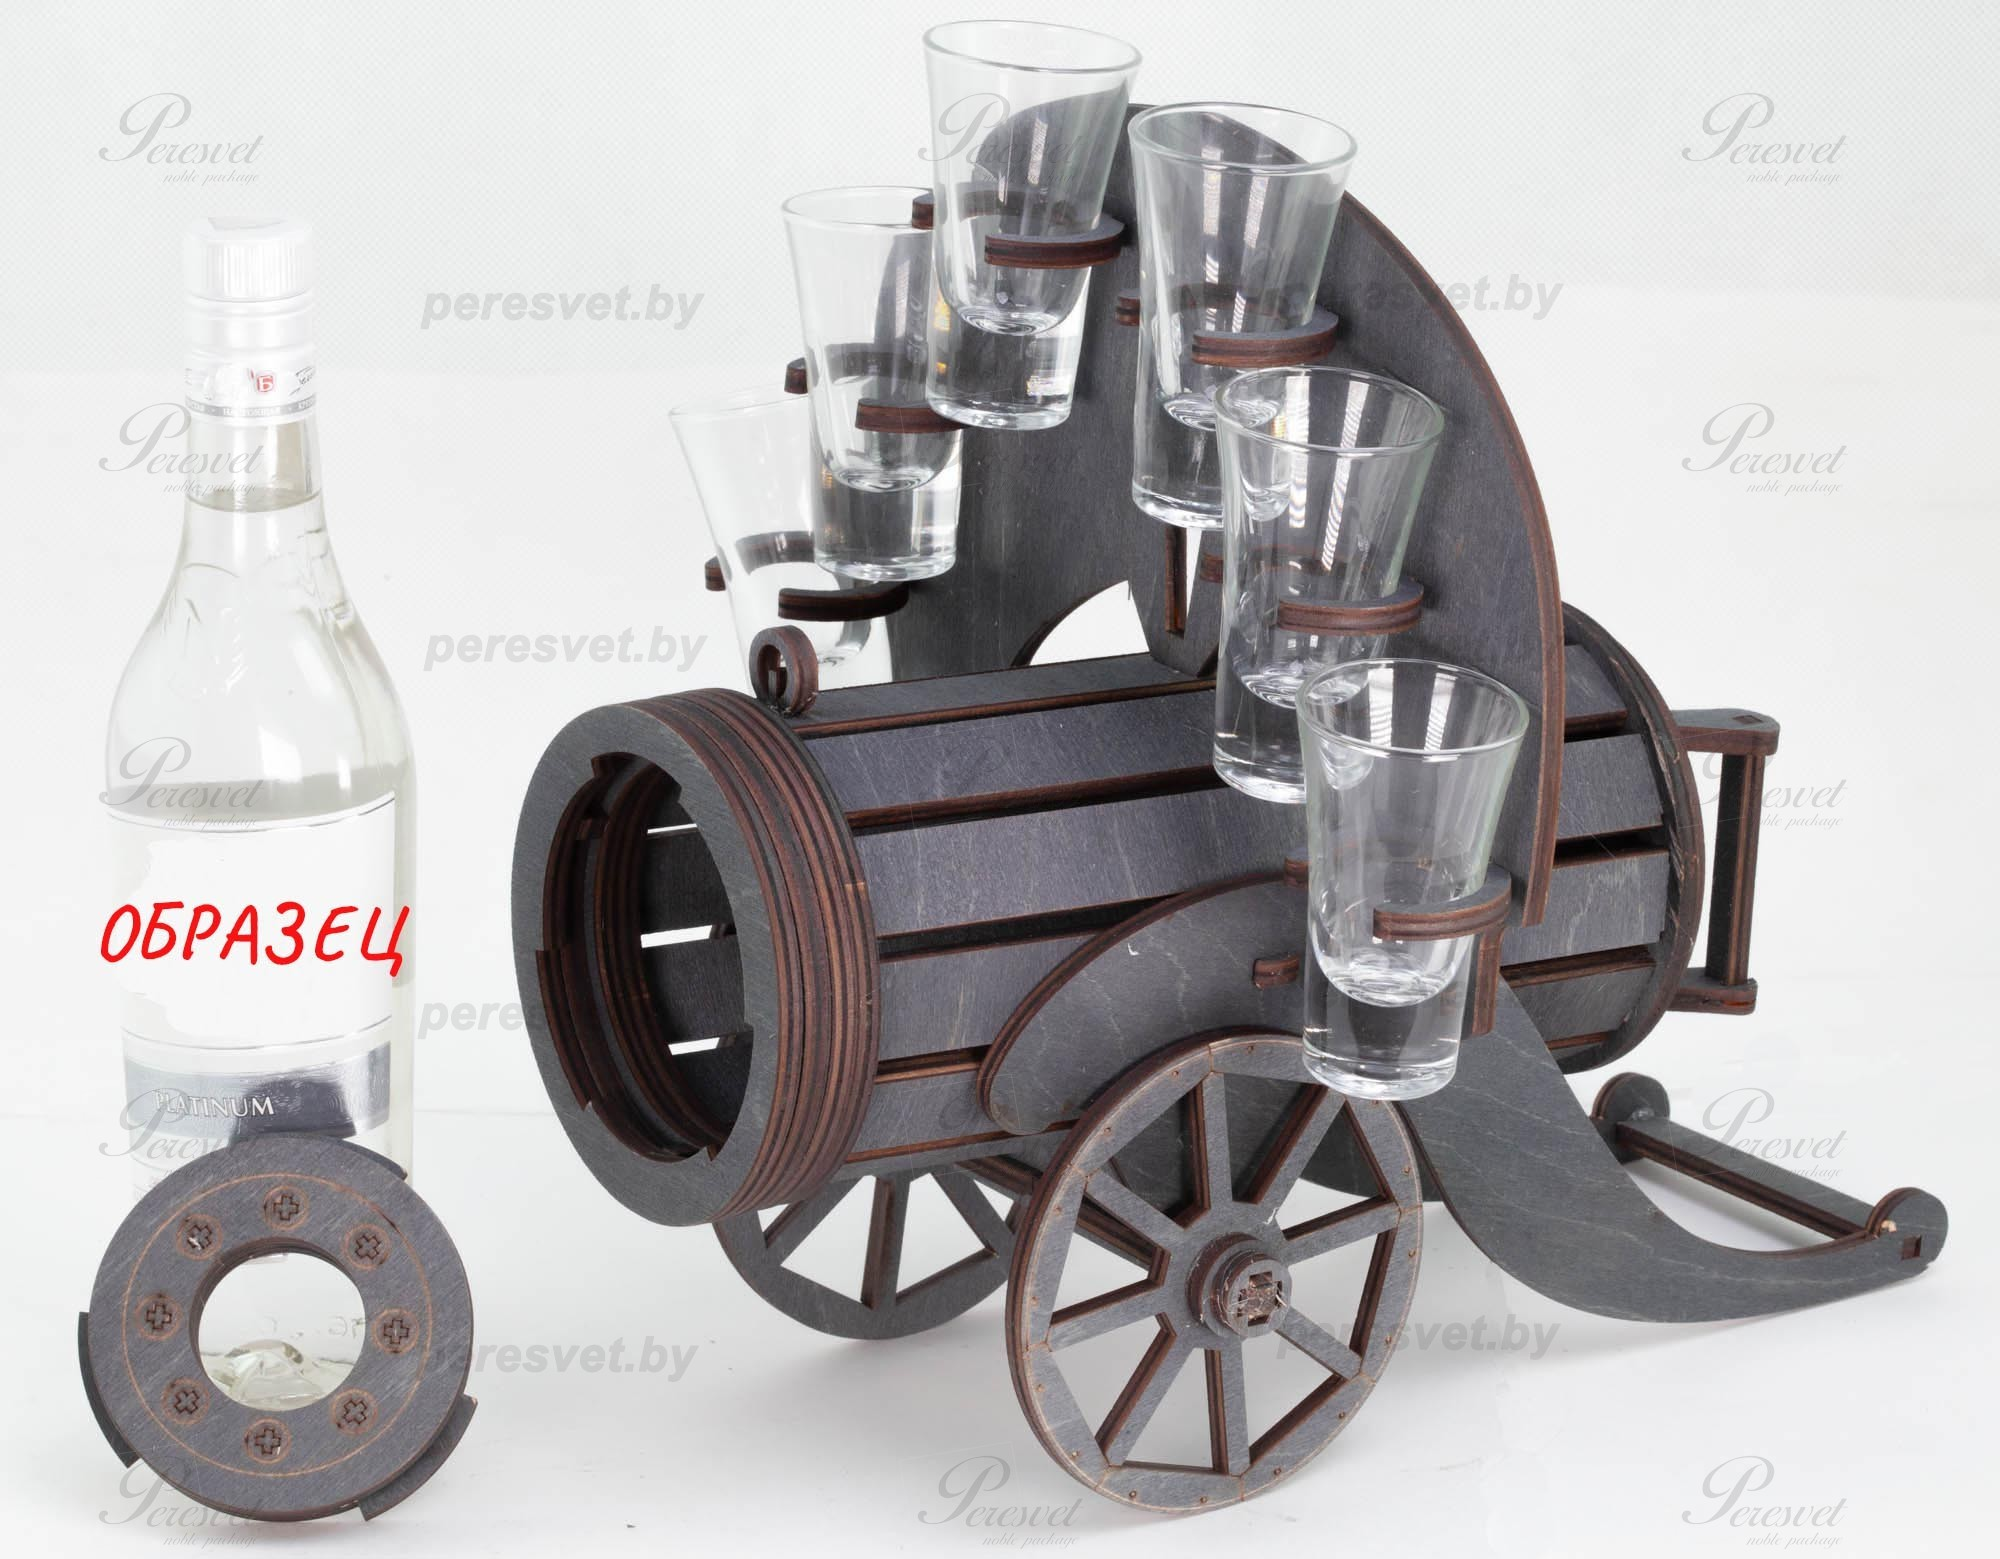 Мини бар Пулемет Cosmo на peresvet.by